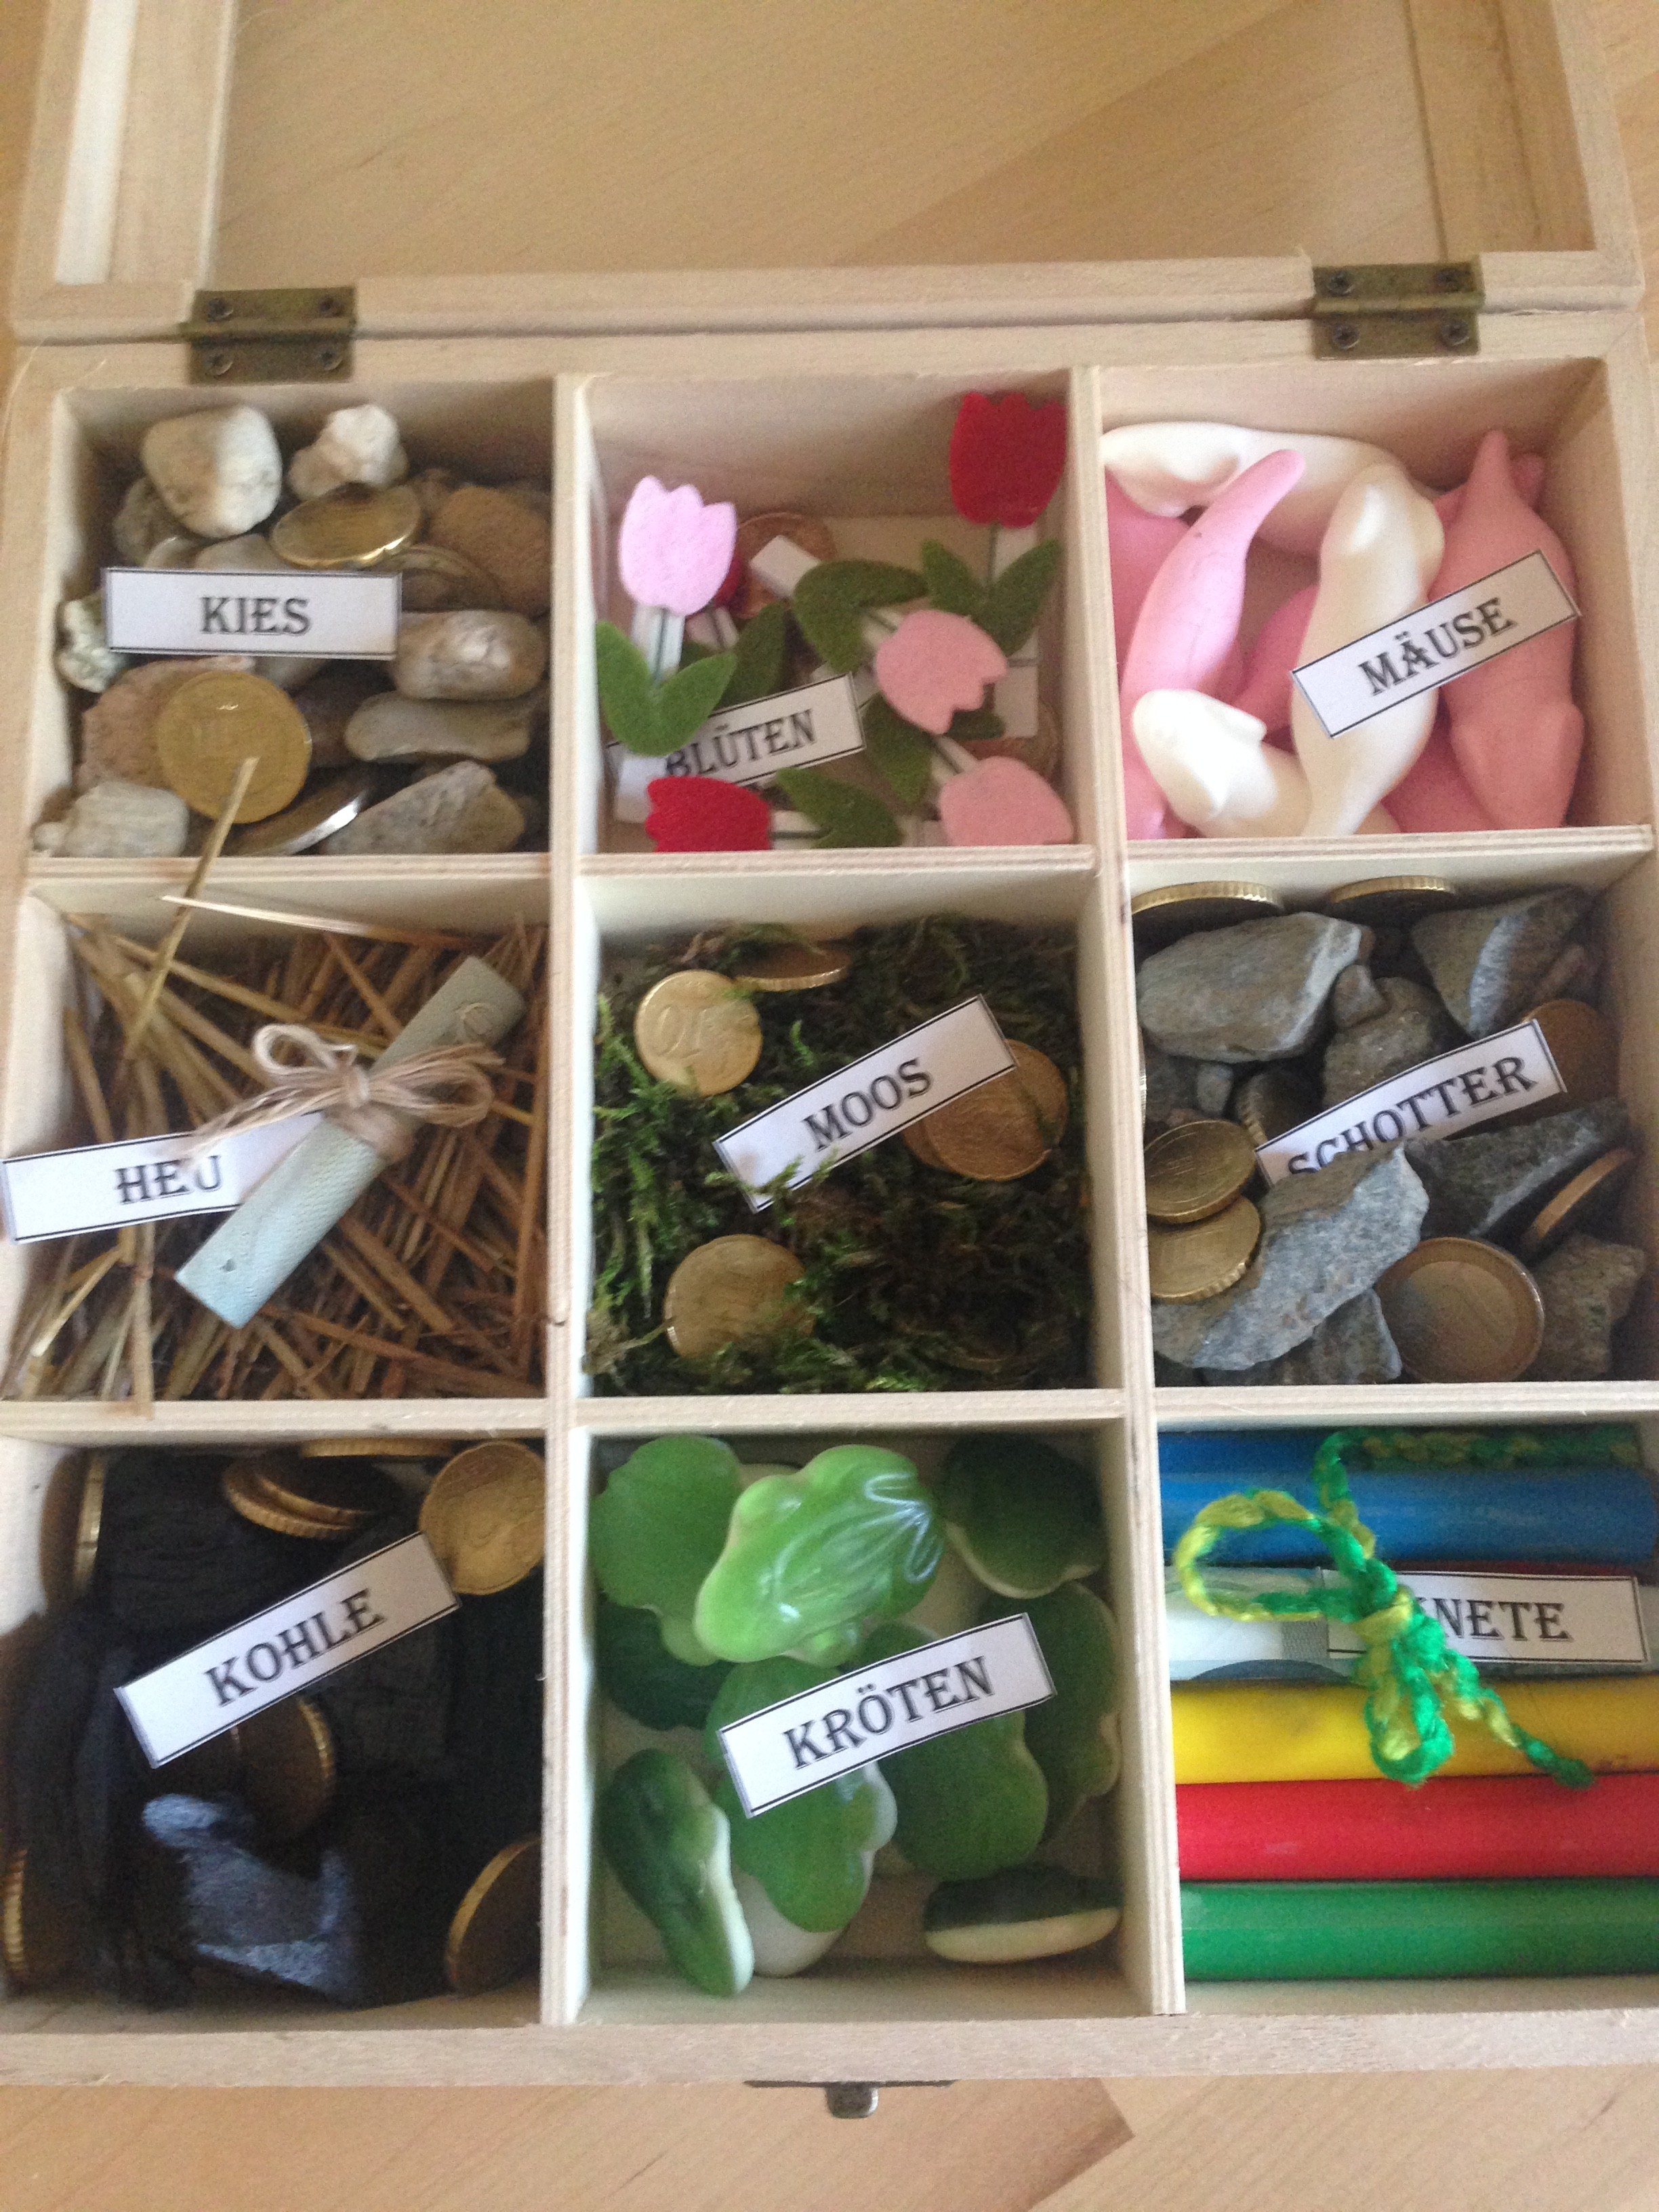 Hochzeitsgeschenk Kiste Kies Kohle Kapanos